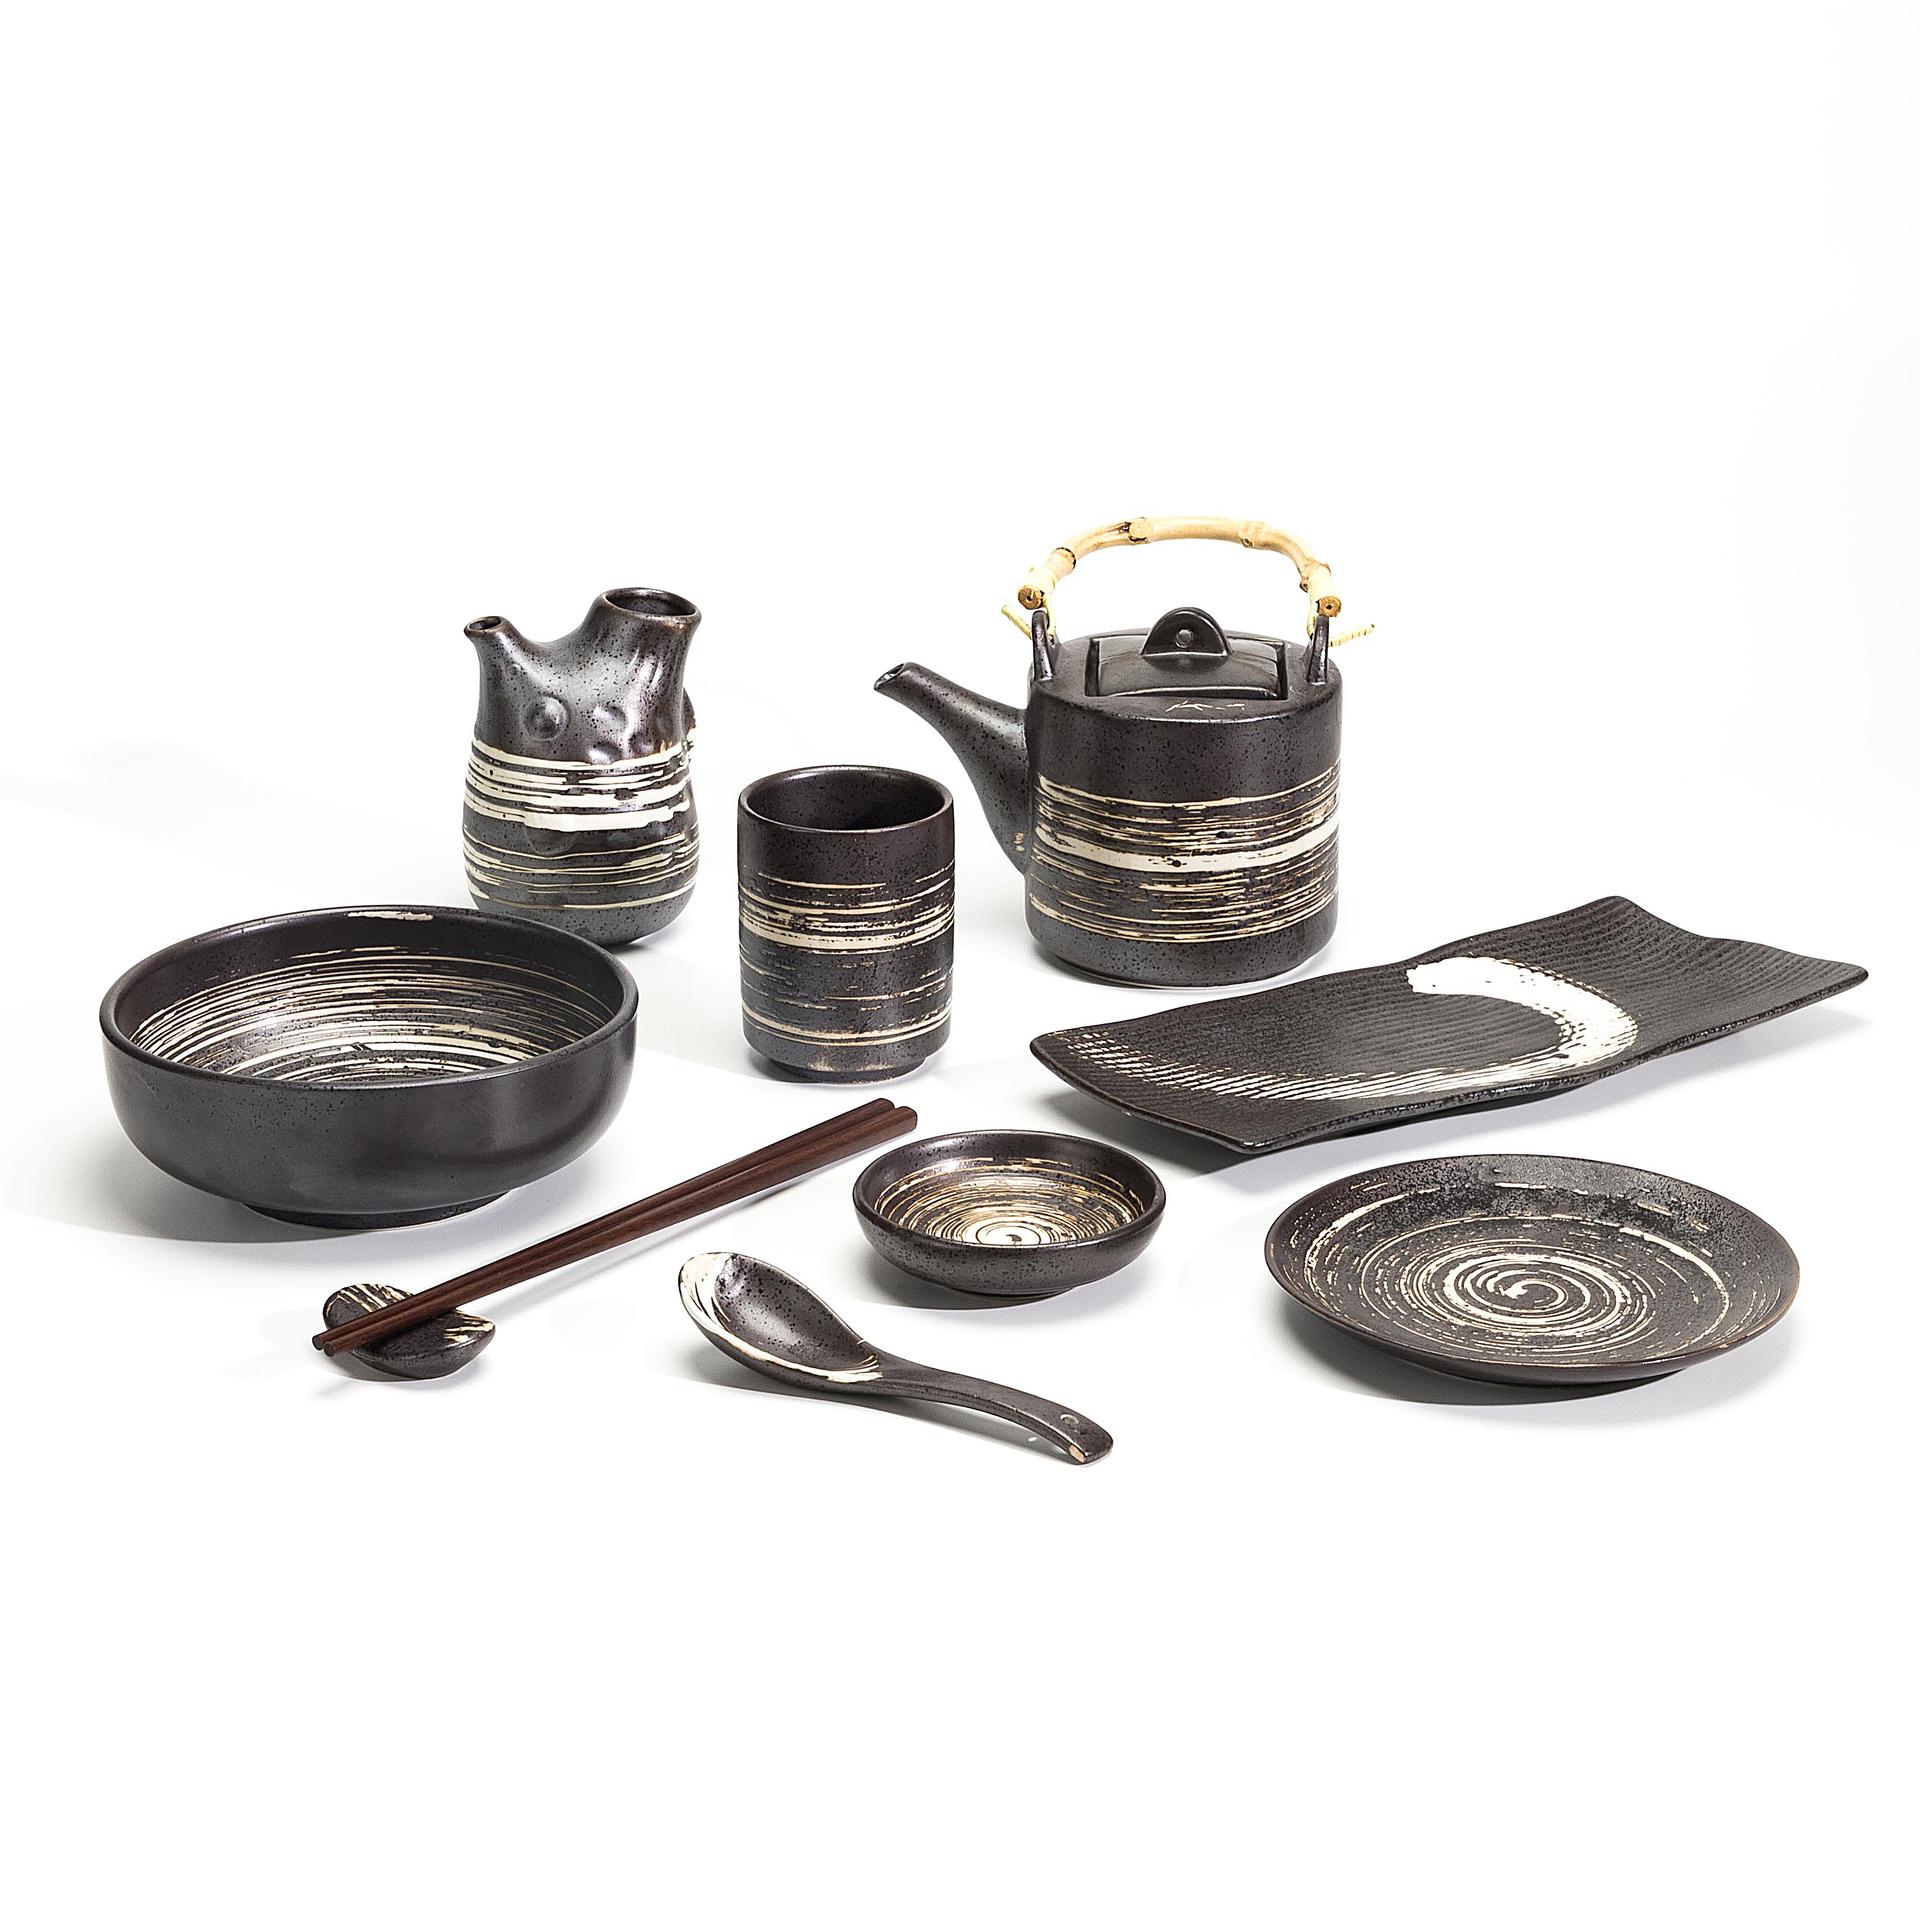 Exquisite Dinnerware Modern Porcelain Tableware Turkish Ceramic Plate Black Soup Bowl, Soup Plate*